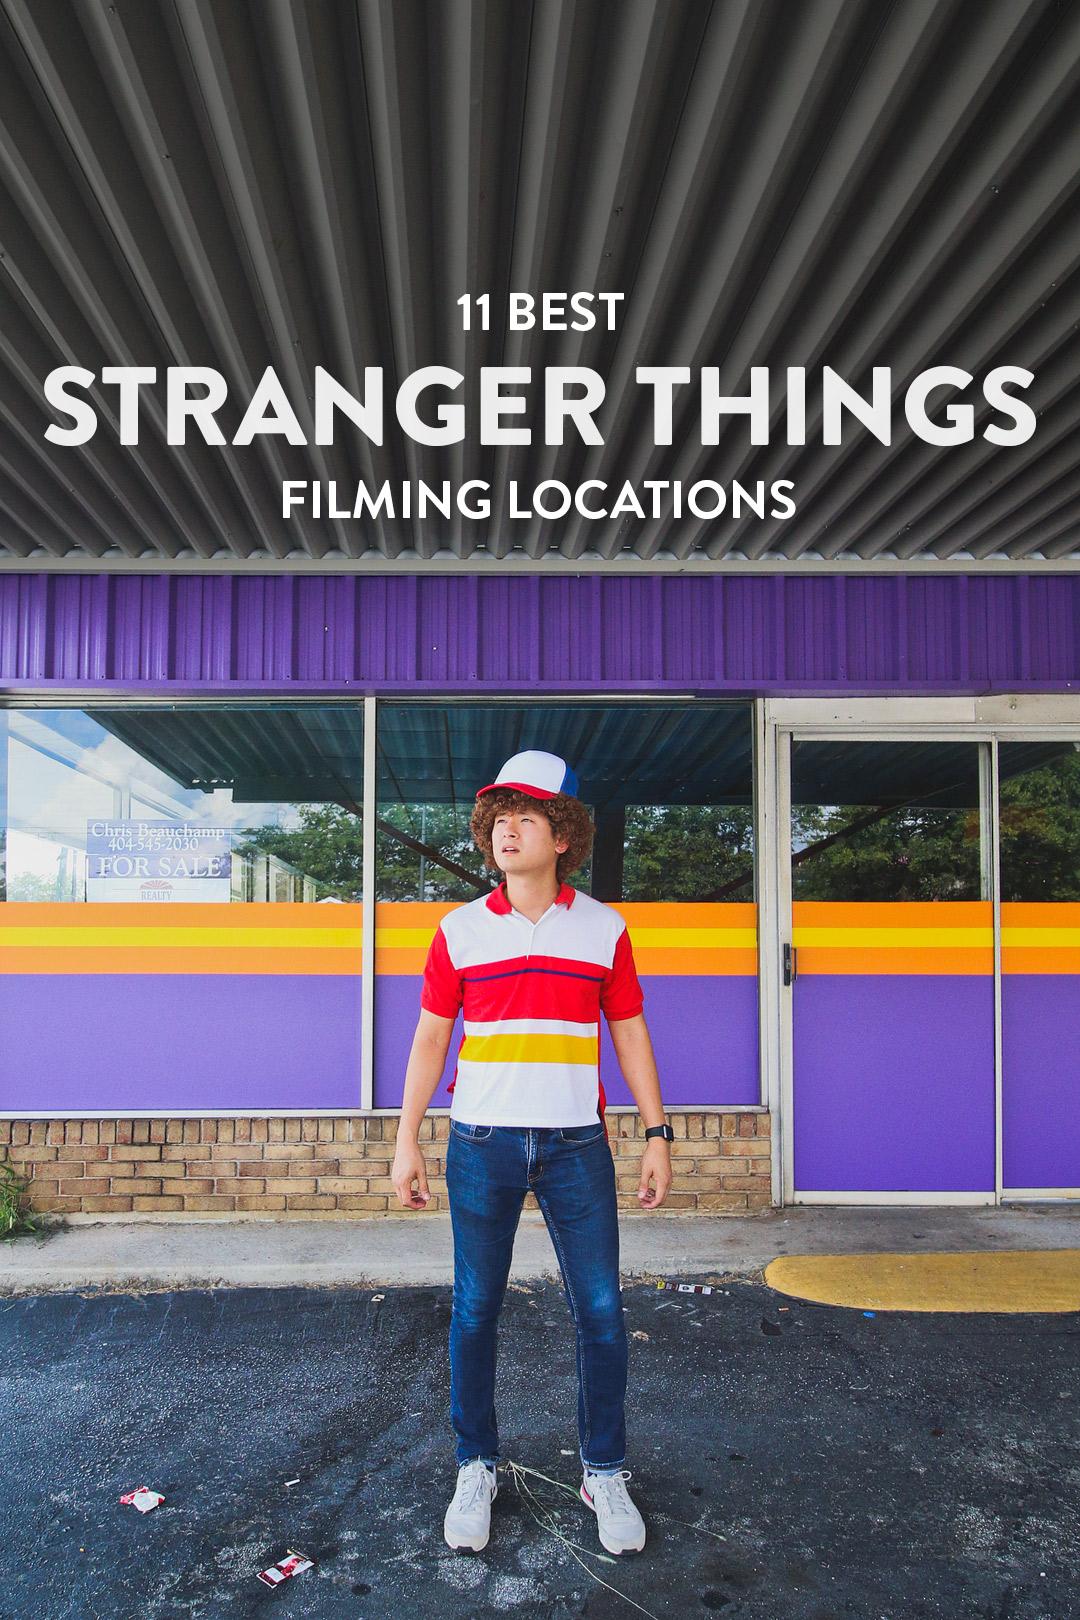 11 Best Stranger Things Filming Locations You Should Visit Now // Local Adventurer #atlanta #georgia #usa #travel #tv #movies #filmlocation #strangerthings